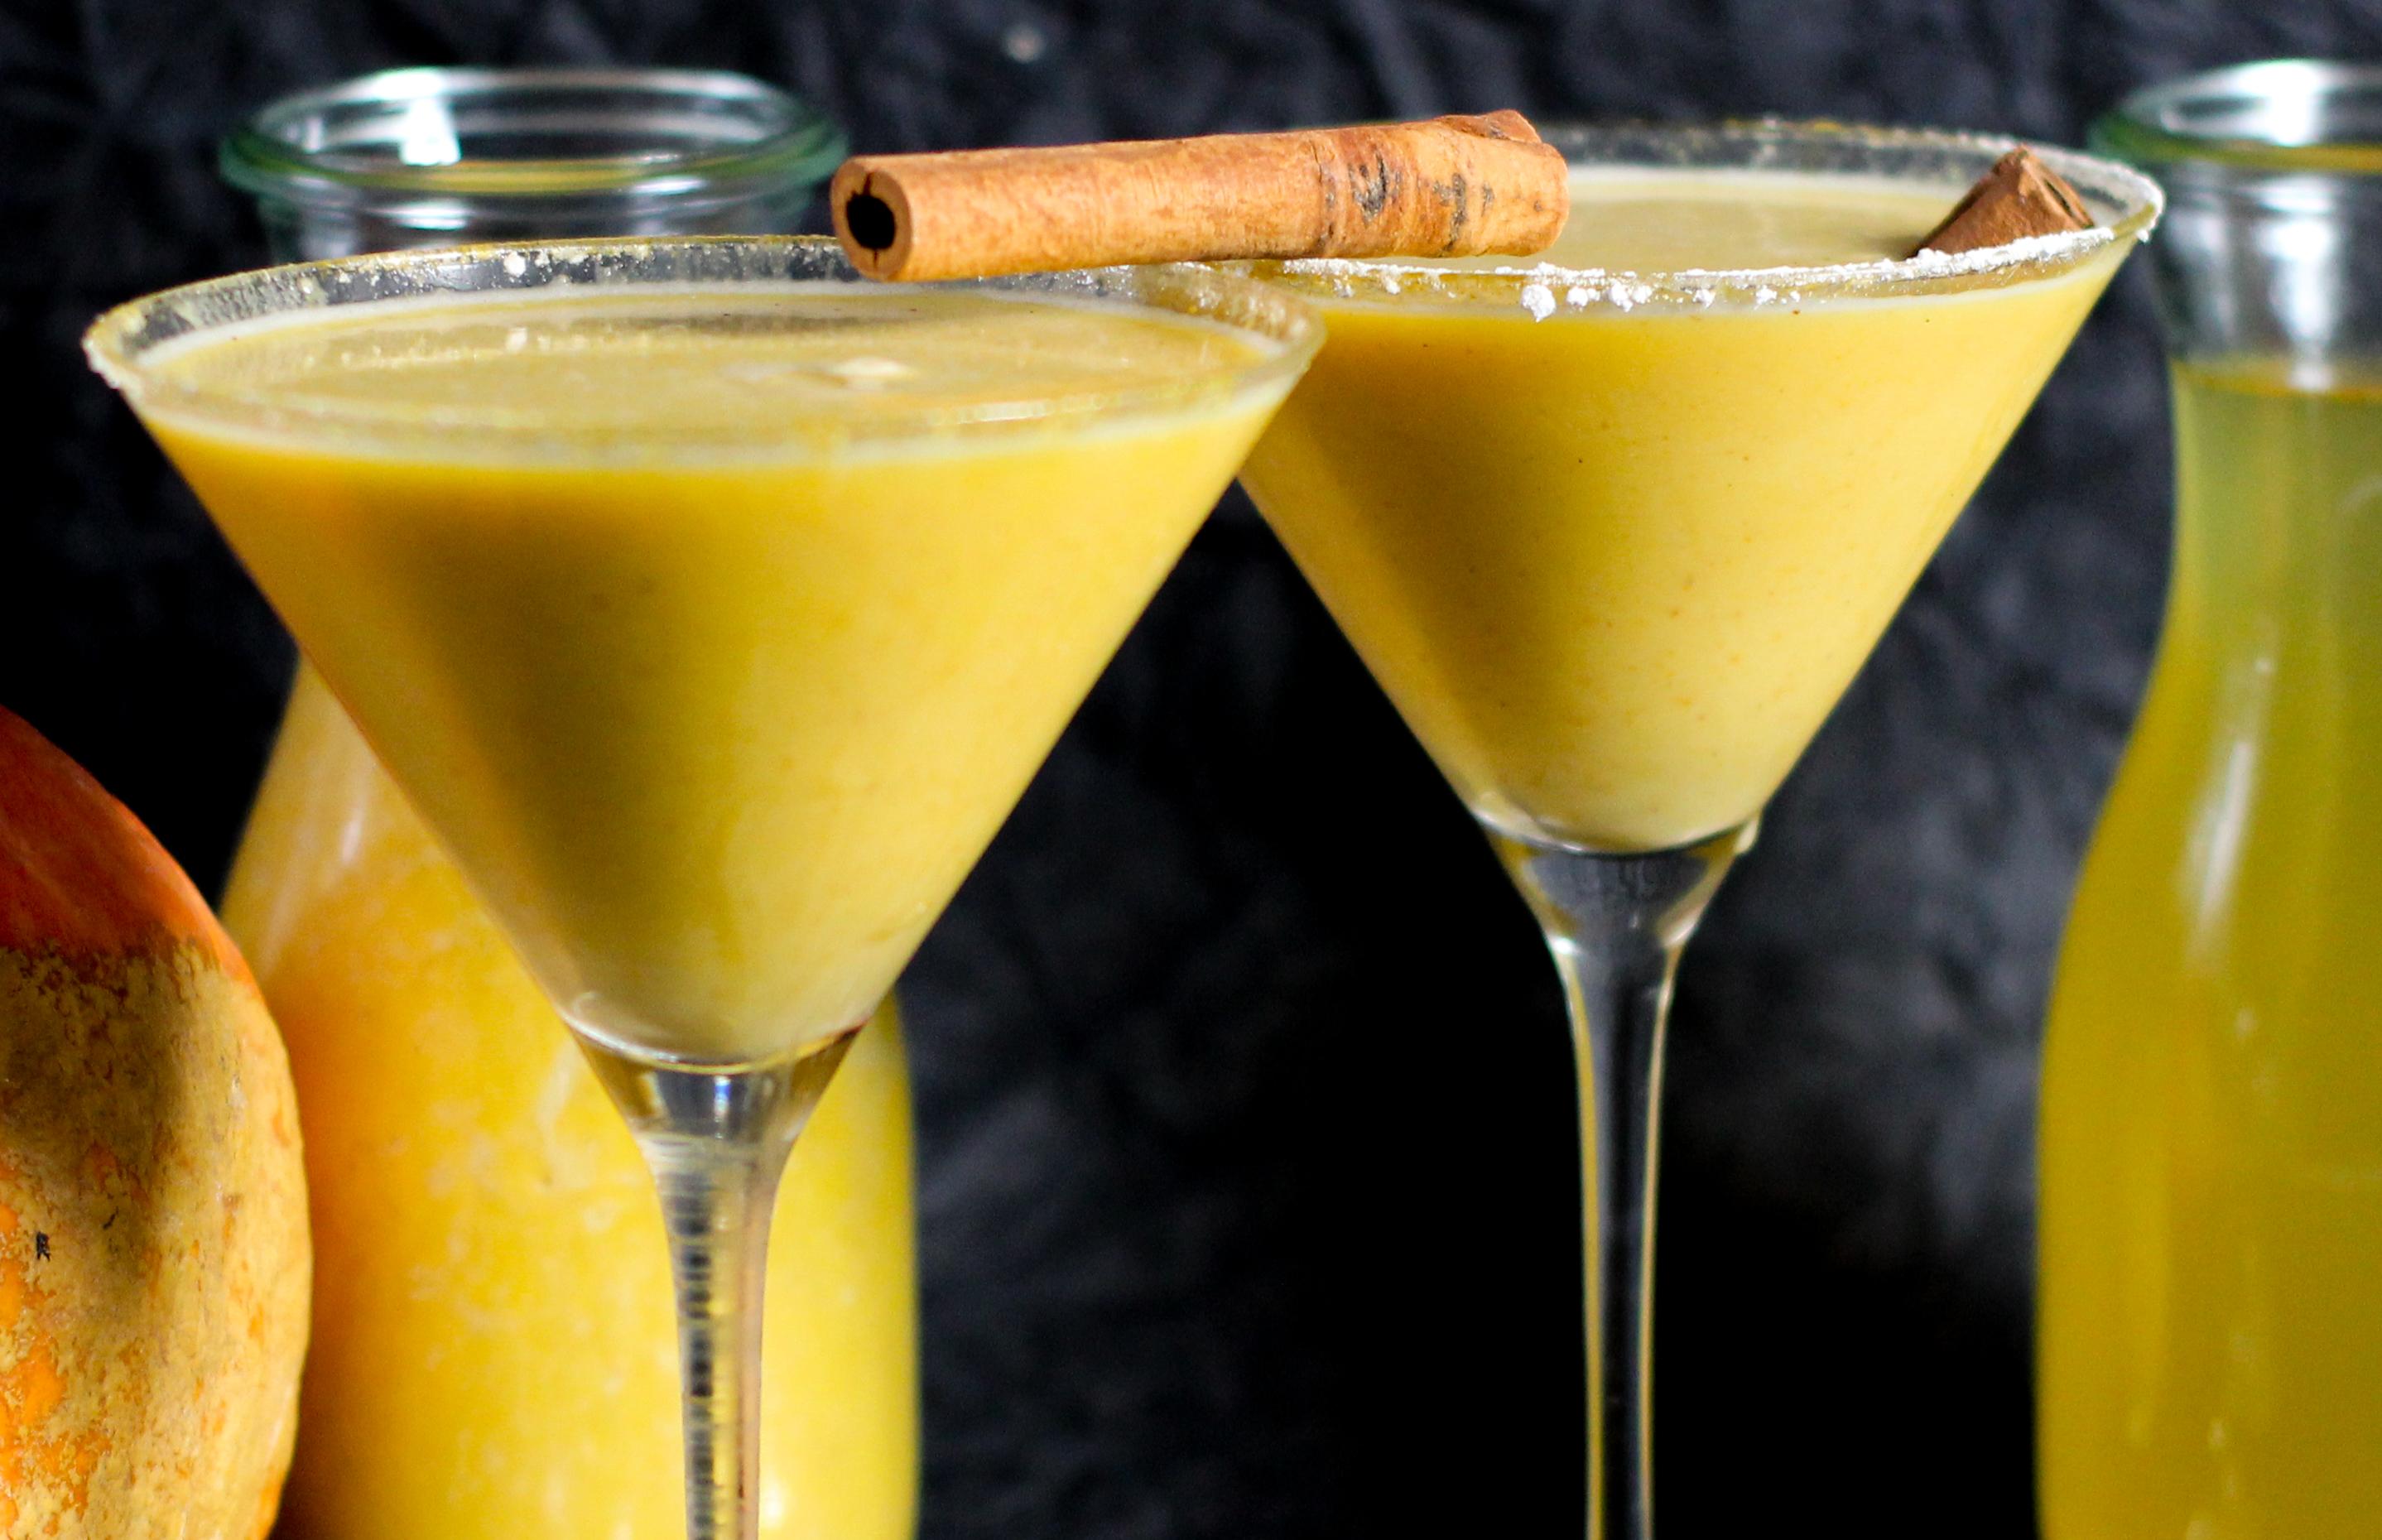 Recipe for Pumpkin Spiced Martini with Pumpkin Spiced Vodka - homemade